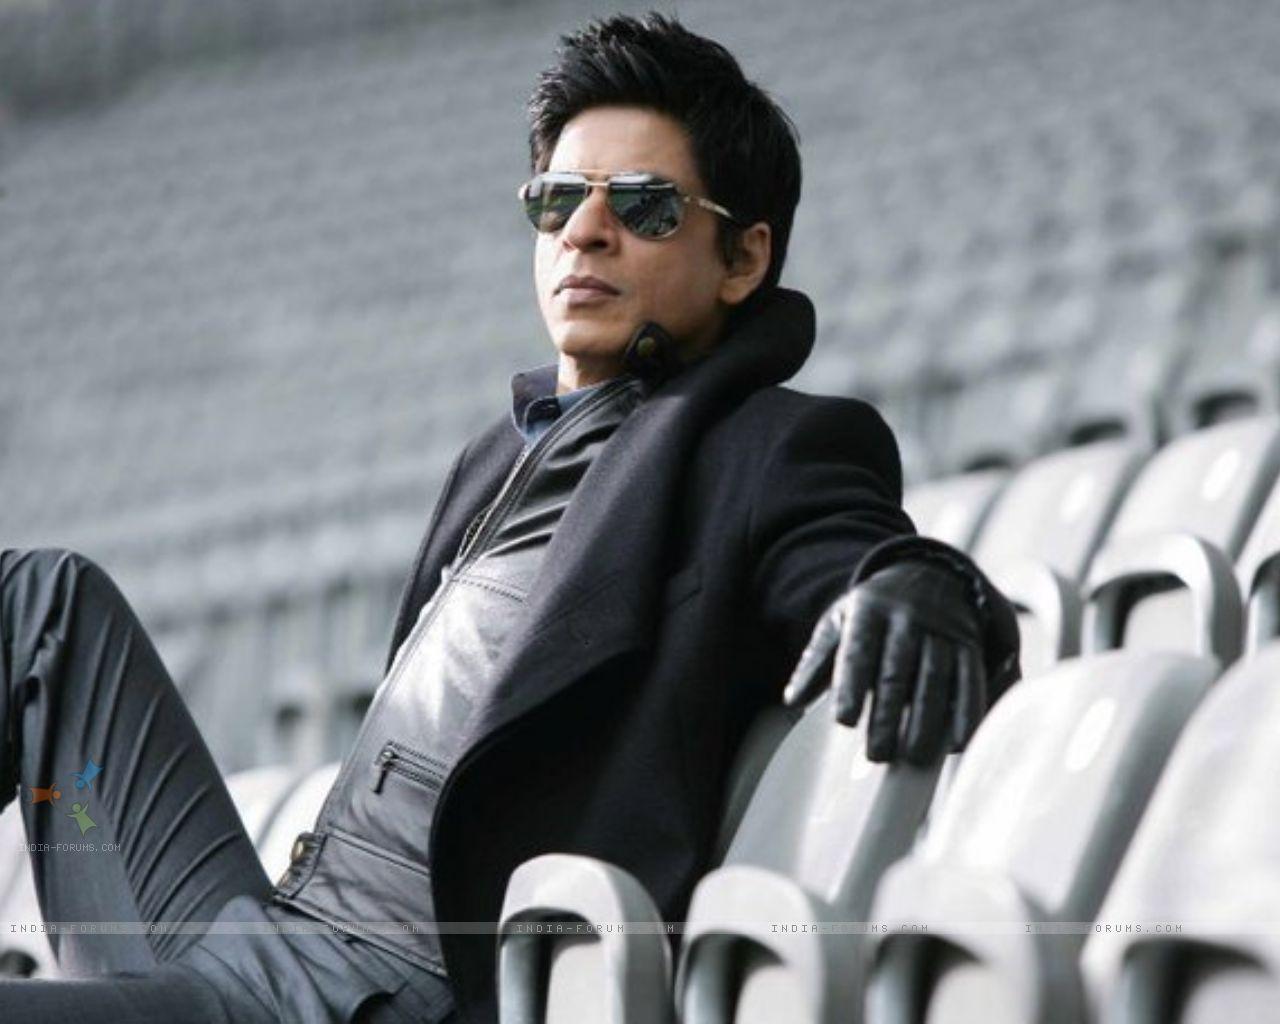 Shahrukh Khan Wallpapers Hd Download Free 1080p: HD Wallpapers: Download Shahrukh Khan Wallpapers HD 2015